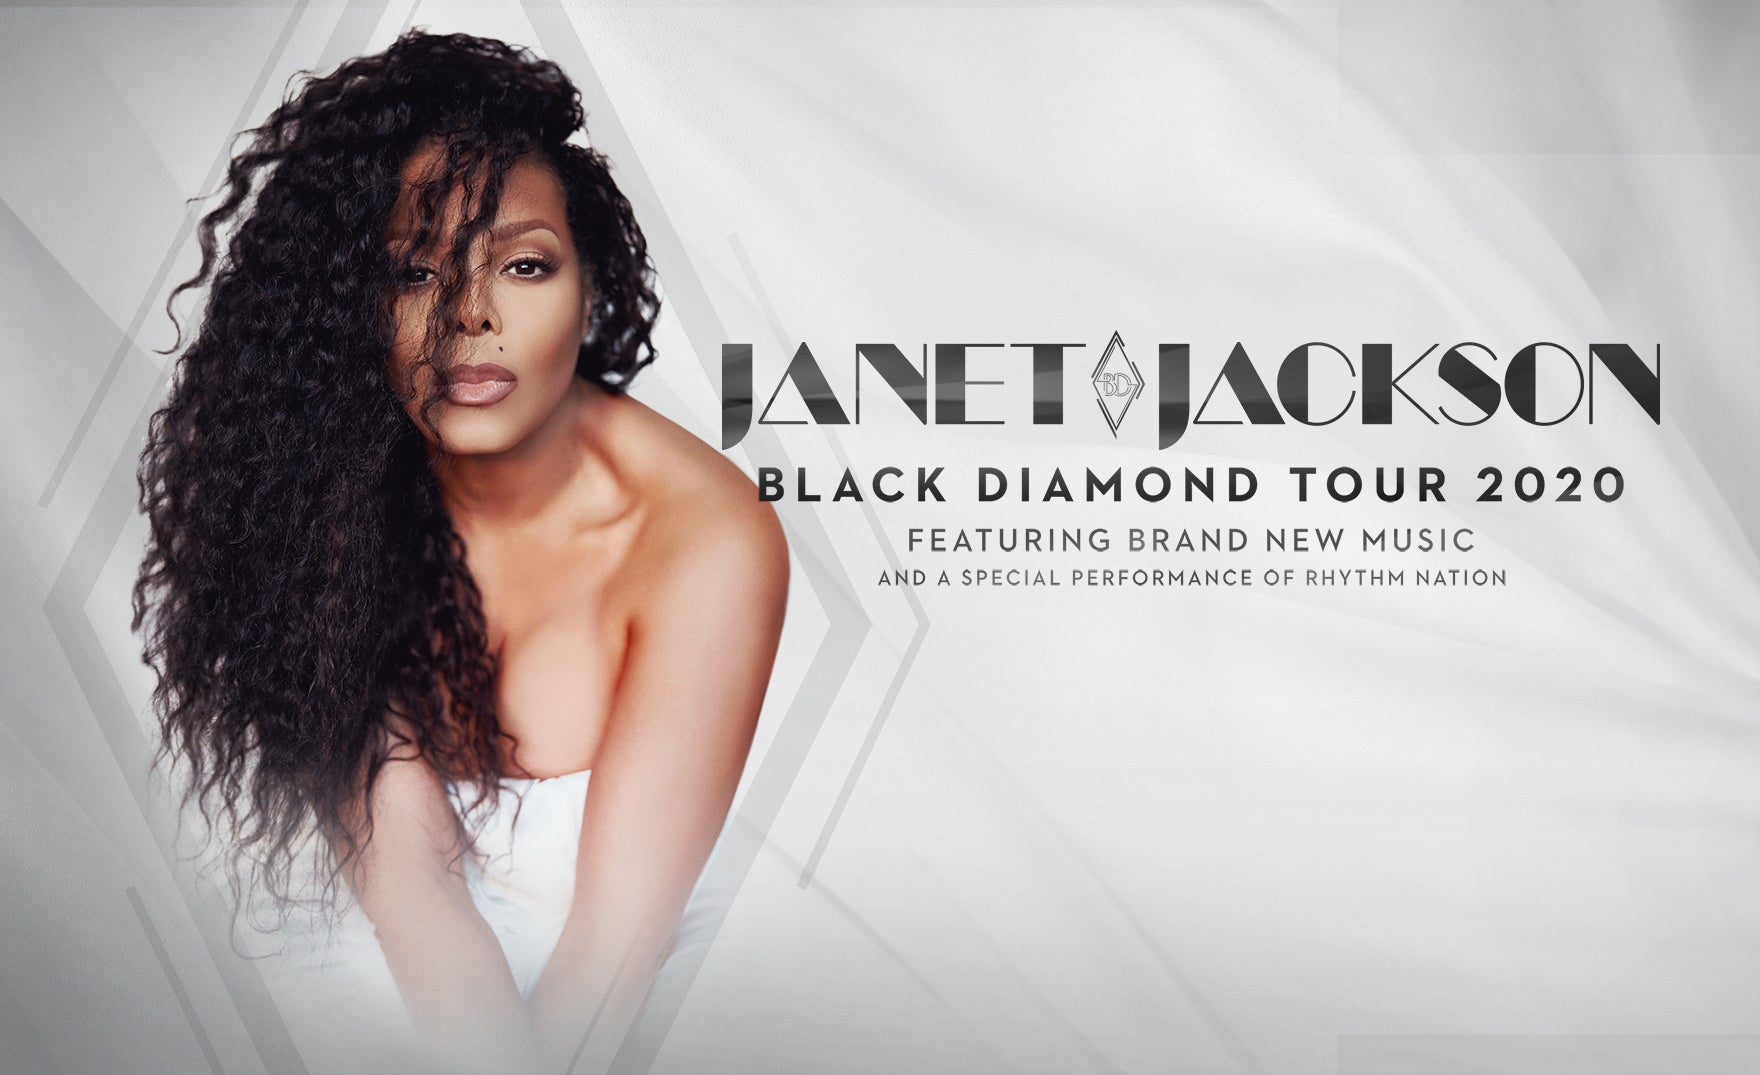 Janet Jackson - Postponed